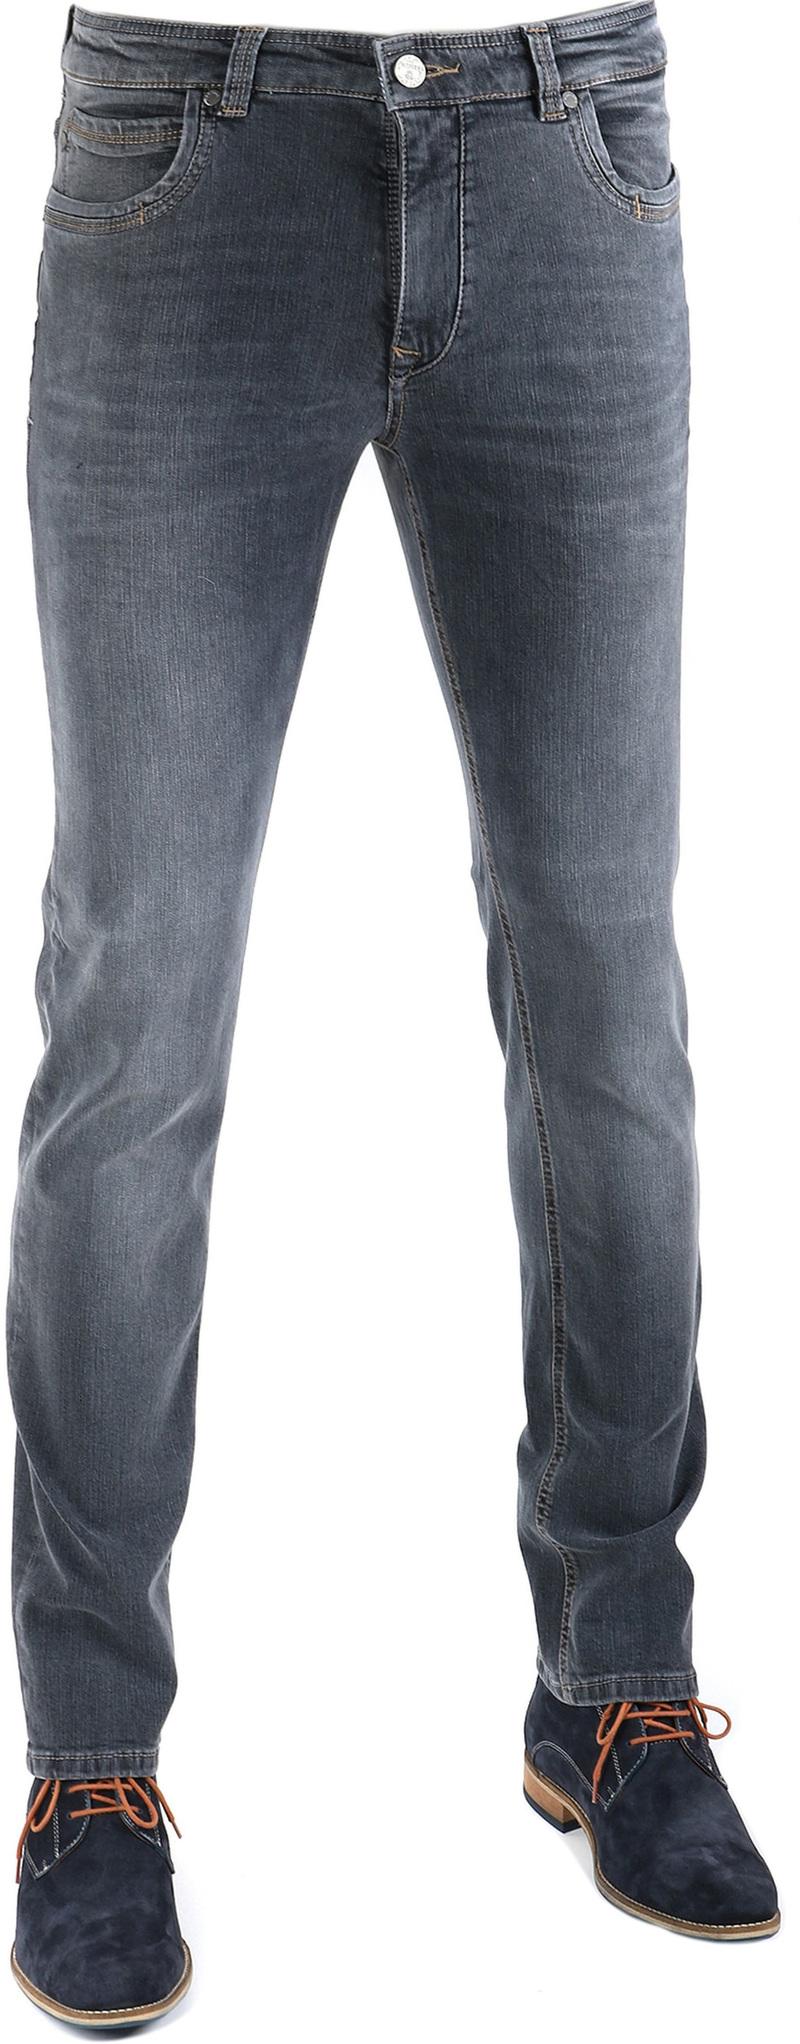 Gardeur Batu Jeans Anthaciet foto 0